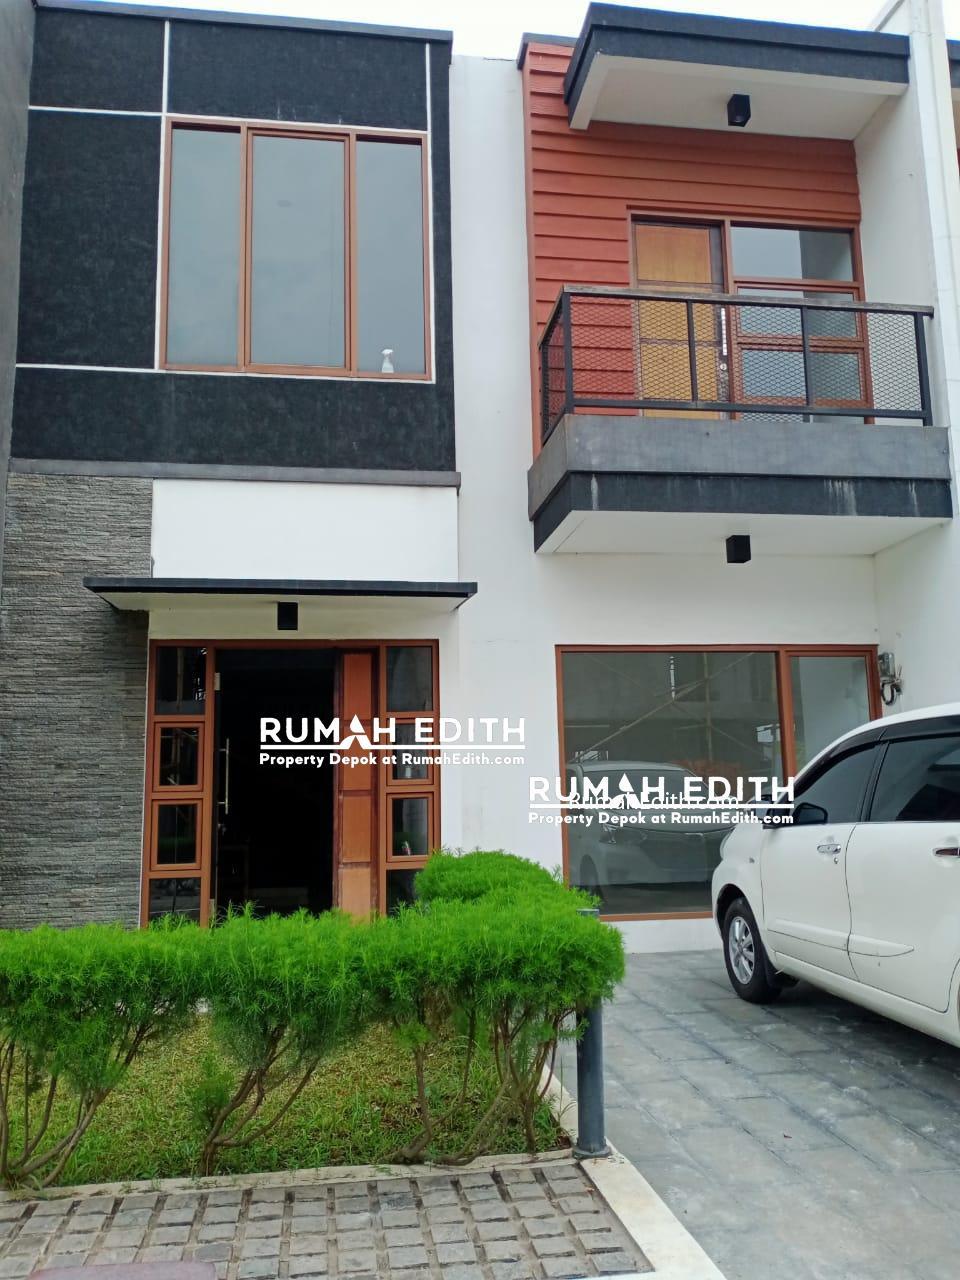 Dijual Rumah di Jagakarsa Jakarta Selatan, 2 Lantai Siap Huni